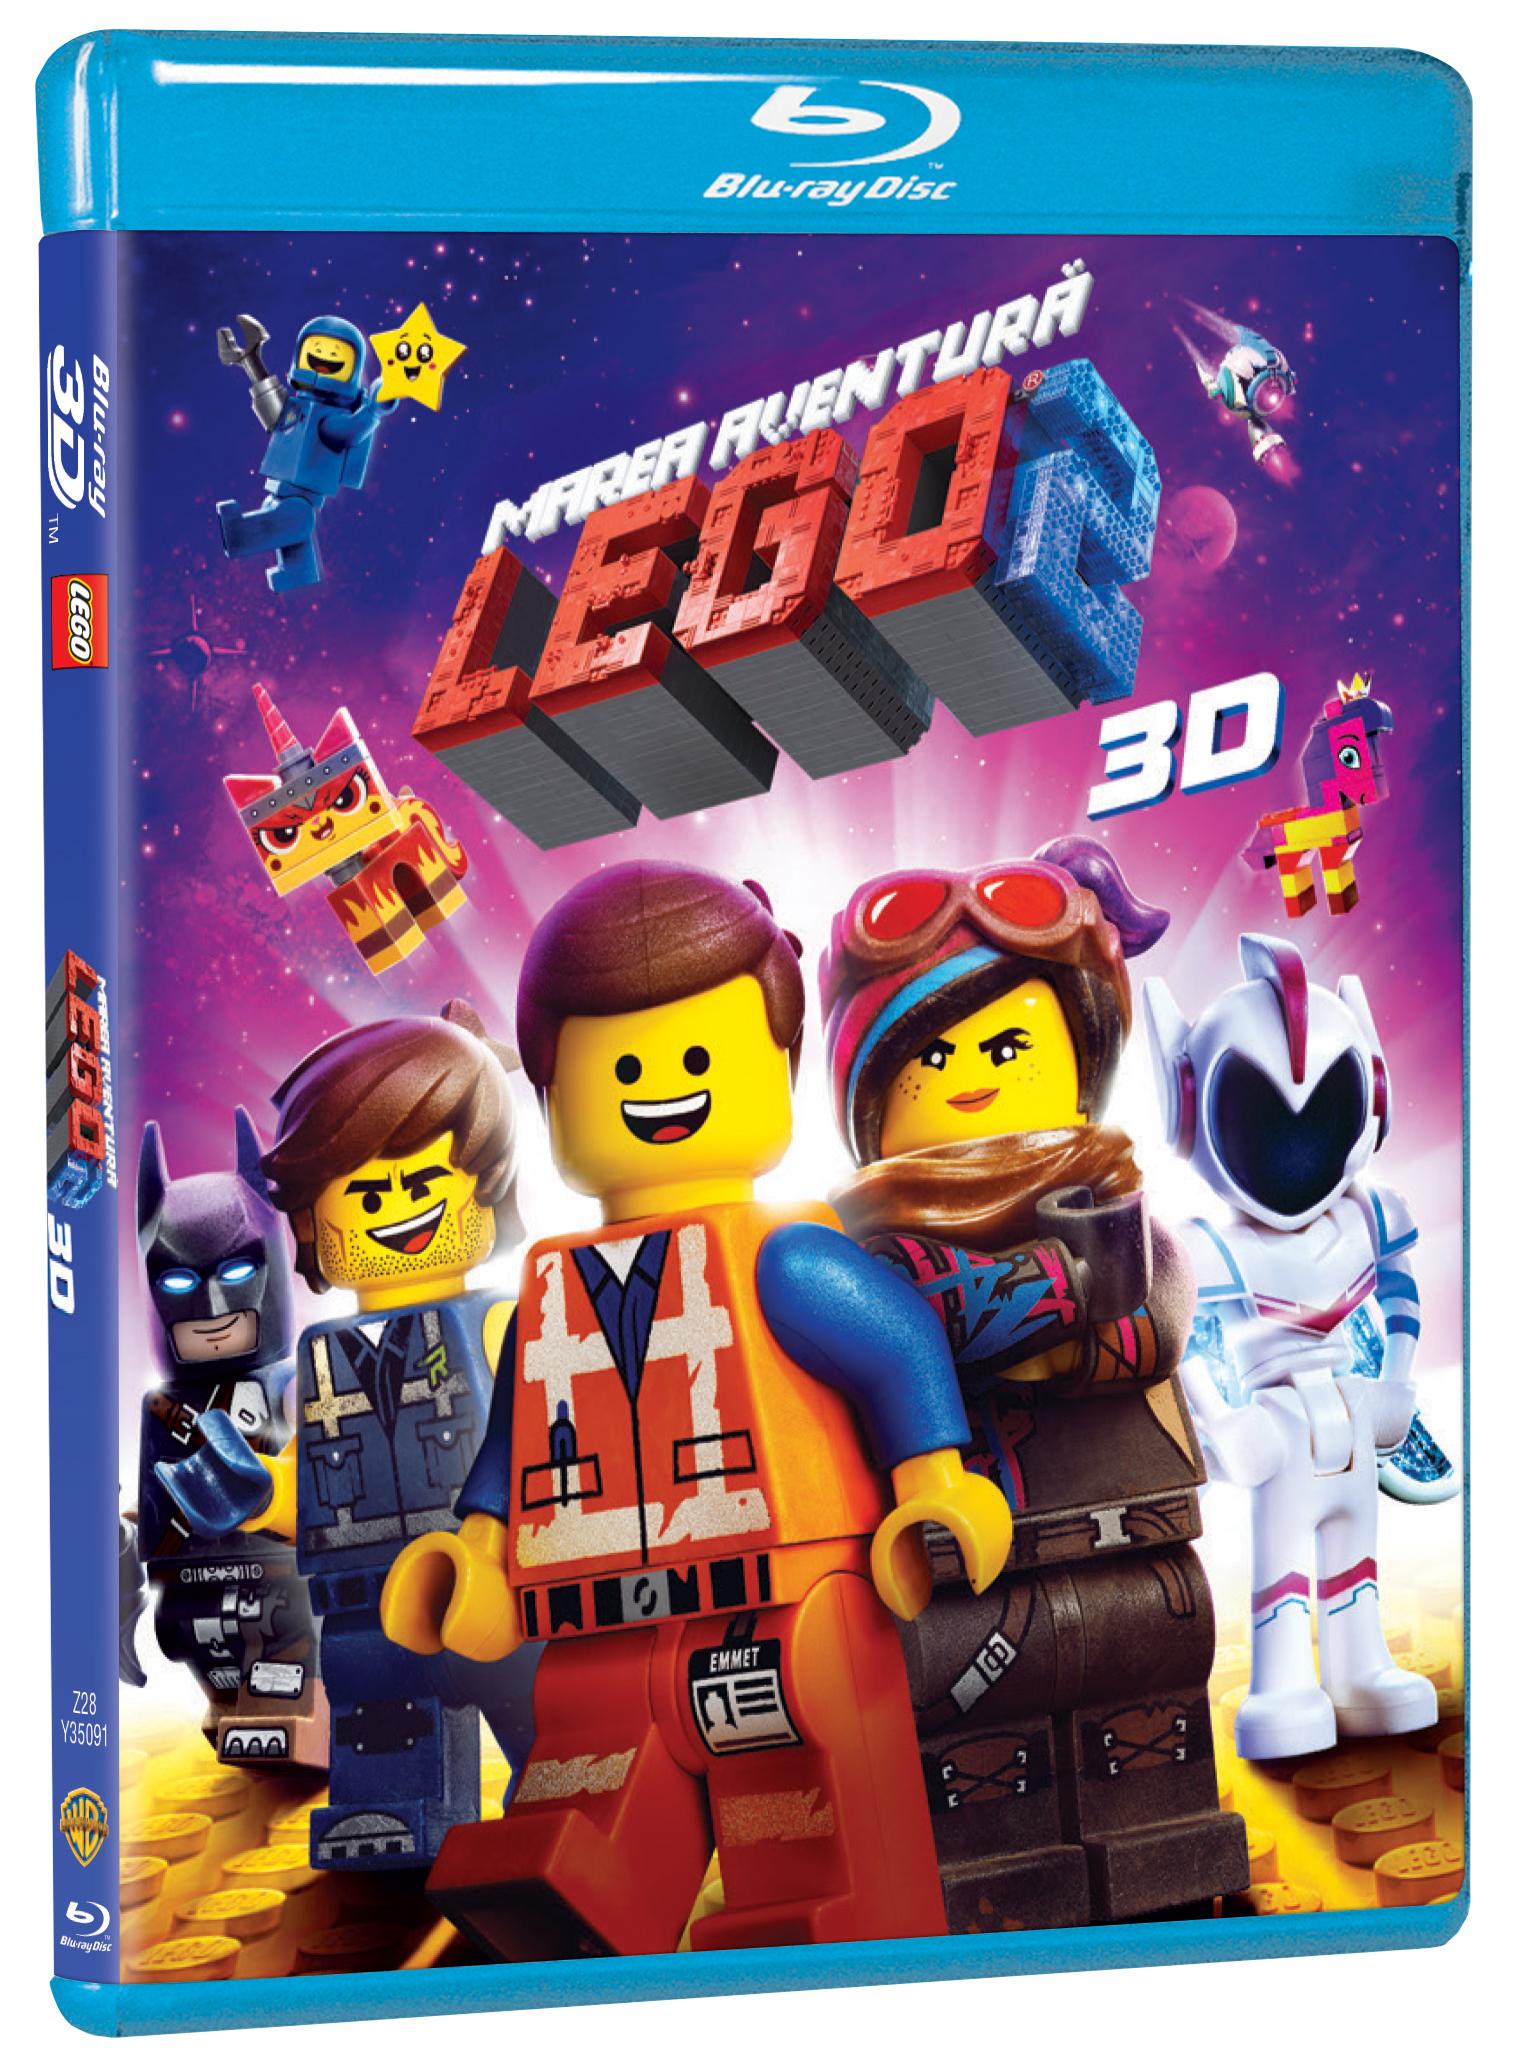 Marea aventura lego 2 / The Lego Movie 2 (Blu-Ray Disc 3D)